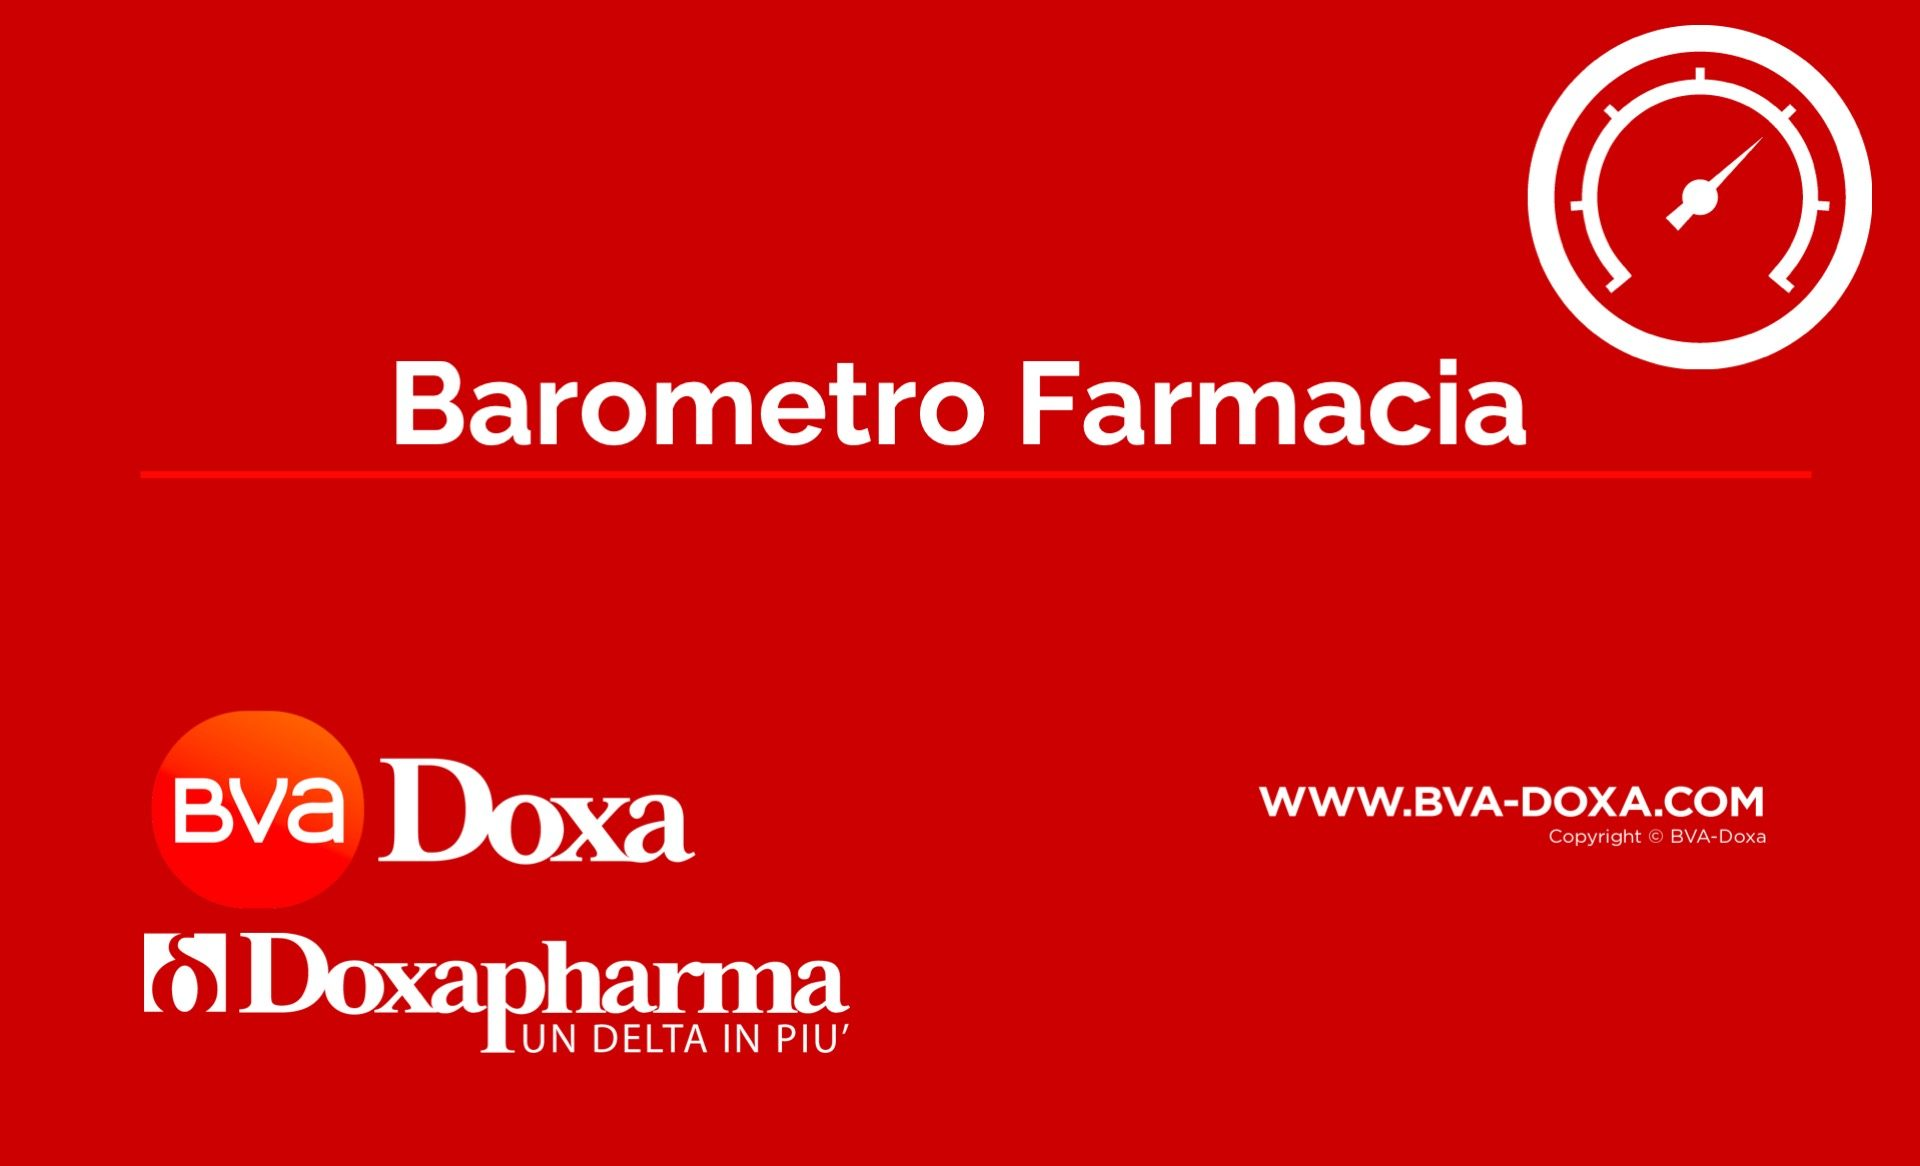 Barometro Farmacia 01